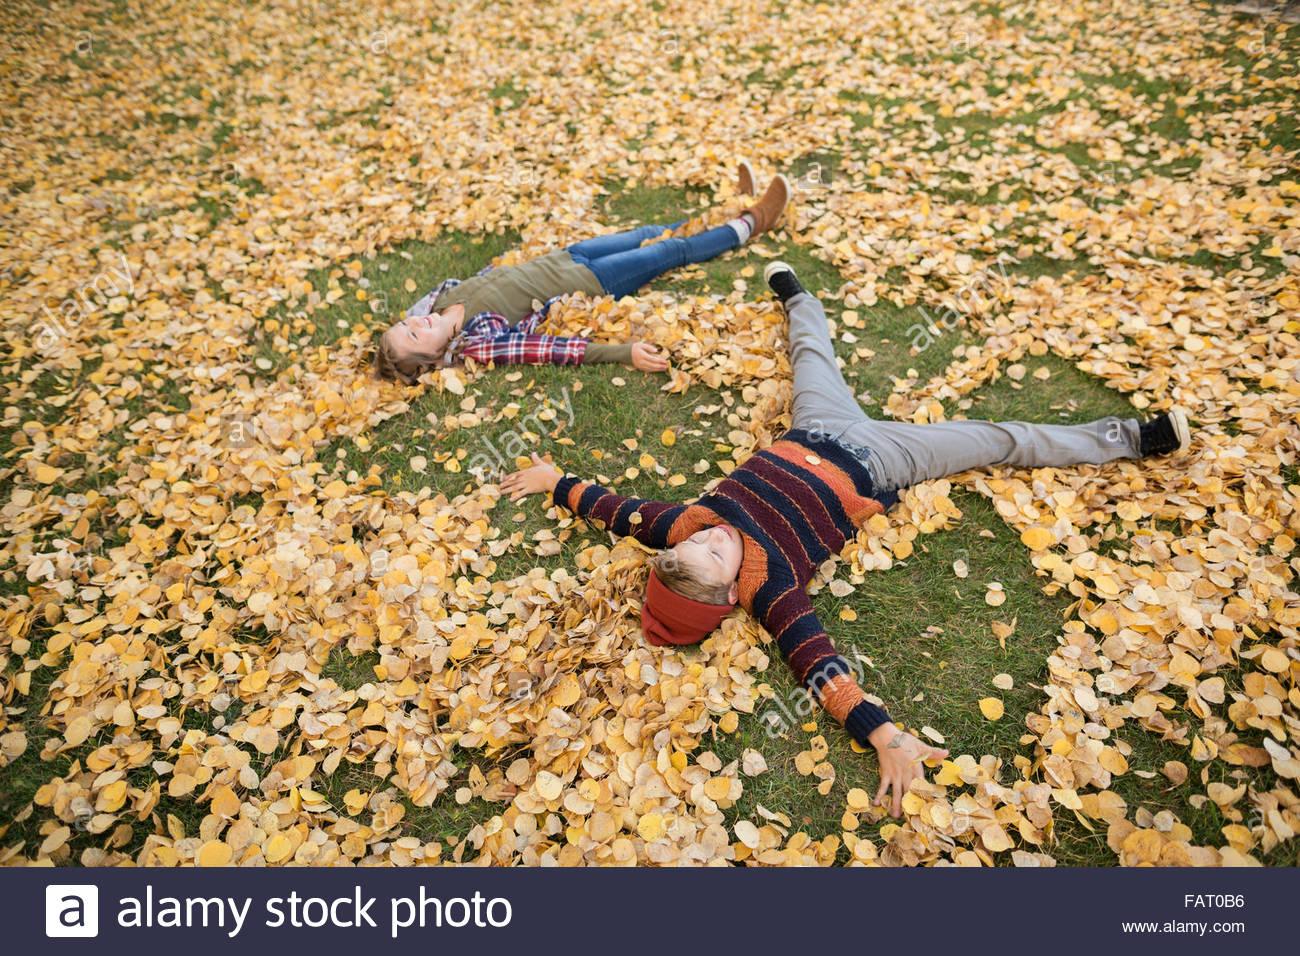 Hermano y hermana hacer ángeles en hojas de otoño Imagen De Stock